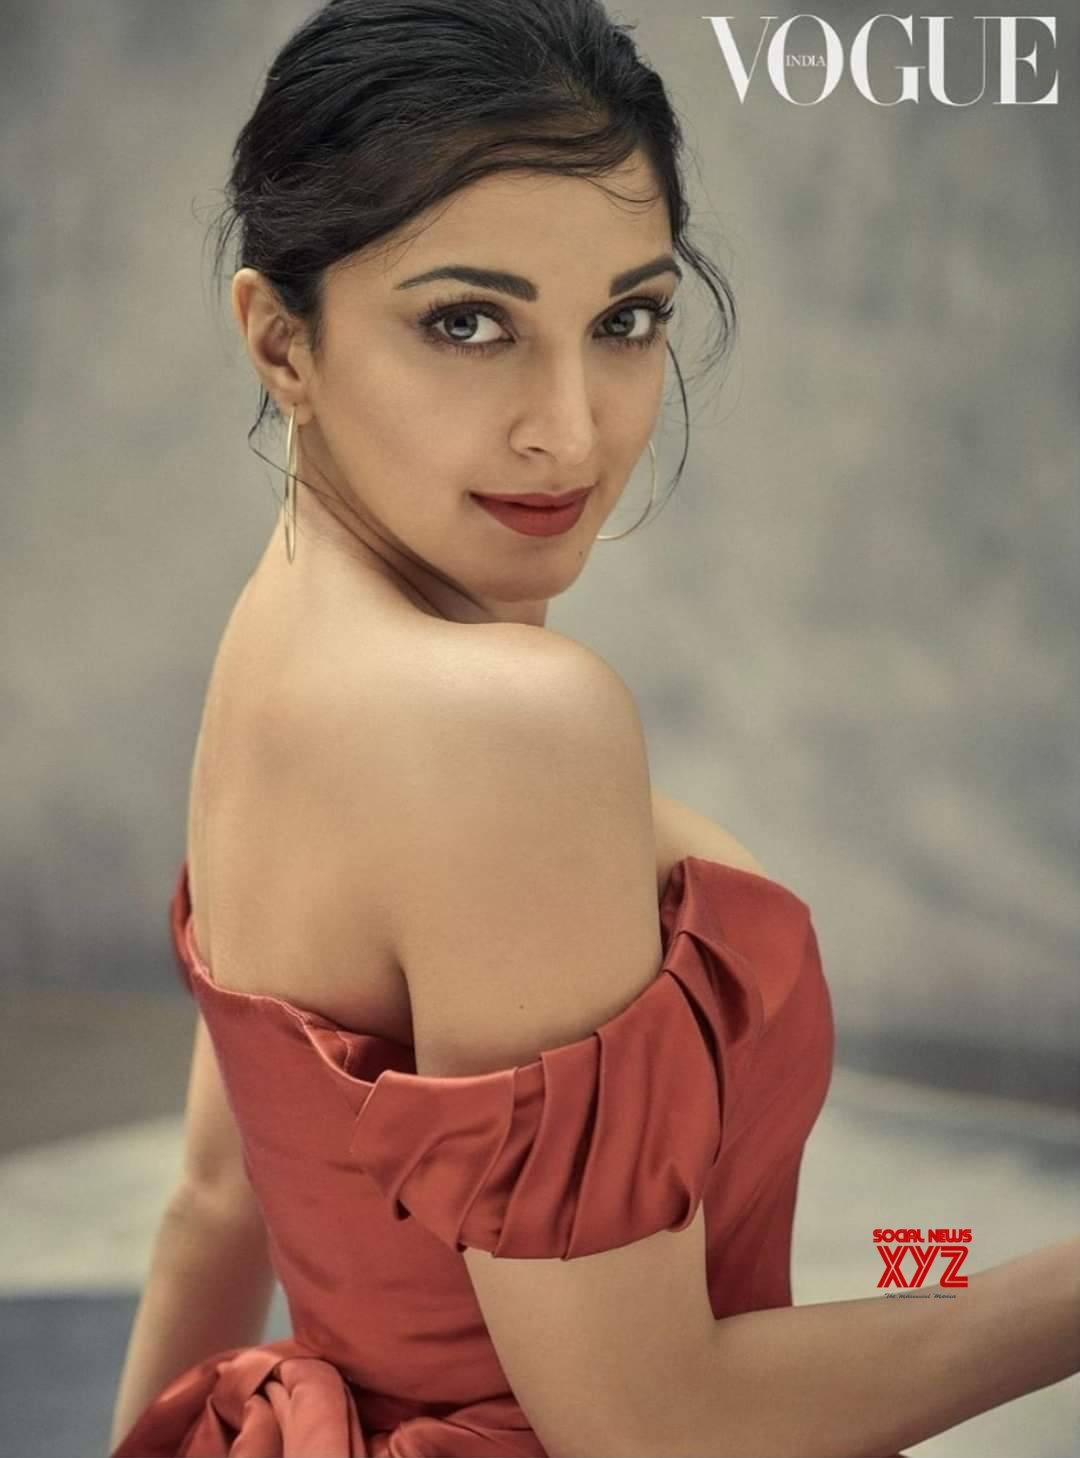 Actress Kiara Advani Hot And Sexy Stills From Vogue Magazine Cover Shoot